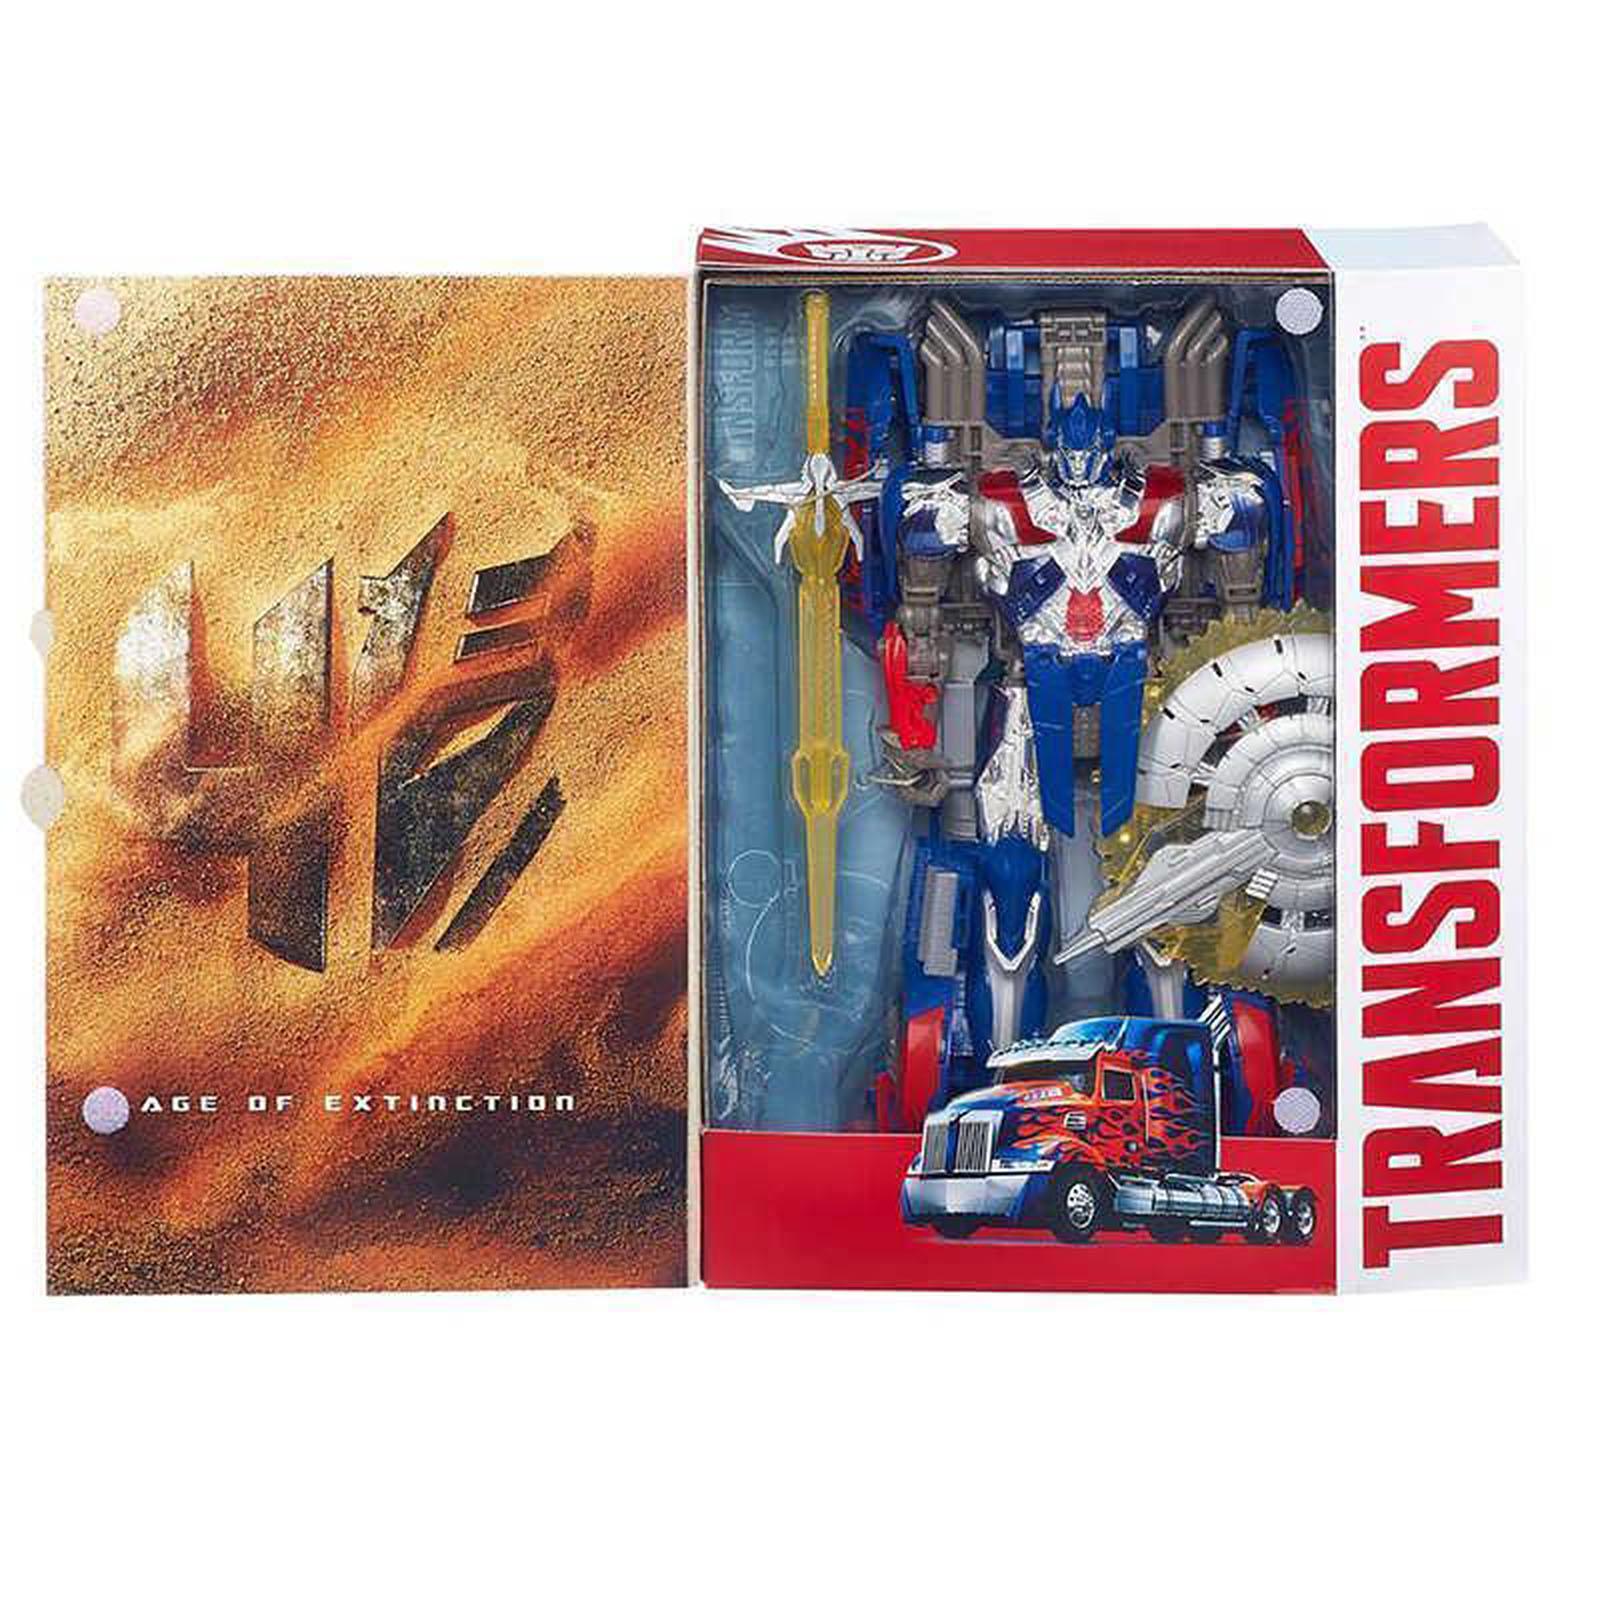 Transformers Takara Jp Ex Age of Extinction #AD02 Voyager Optimus Prime New